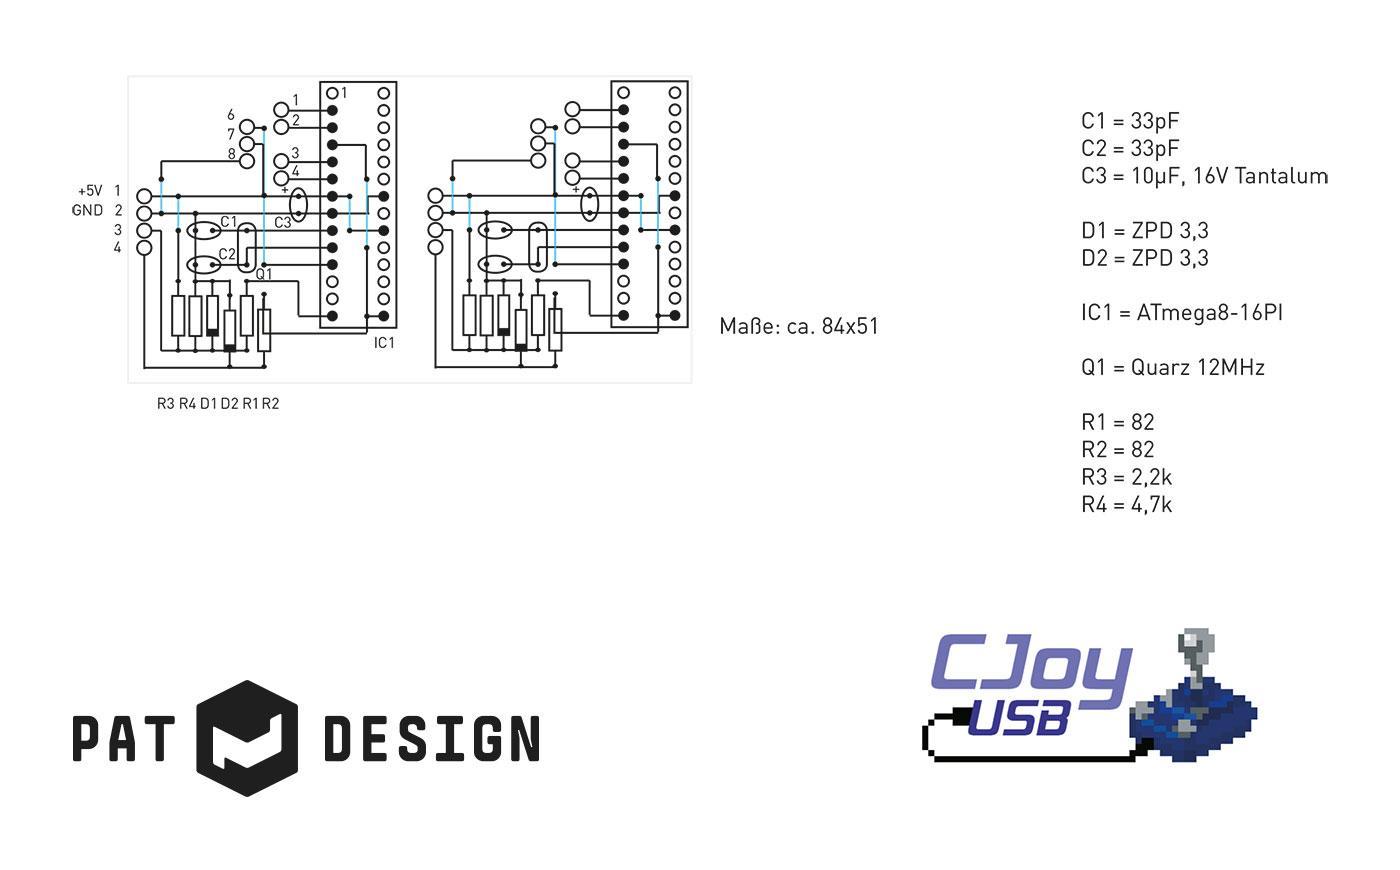 CJoy64 USB-Adapter, Bauplan